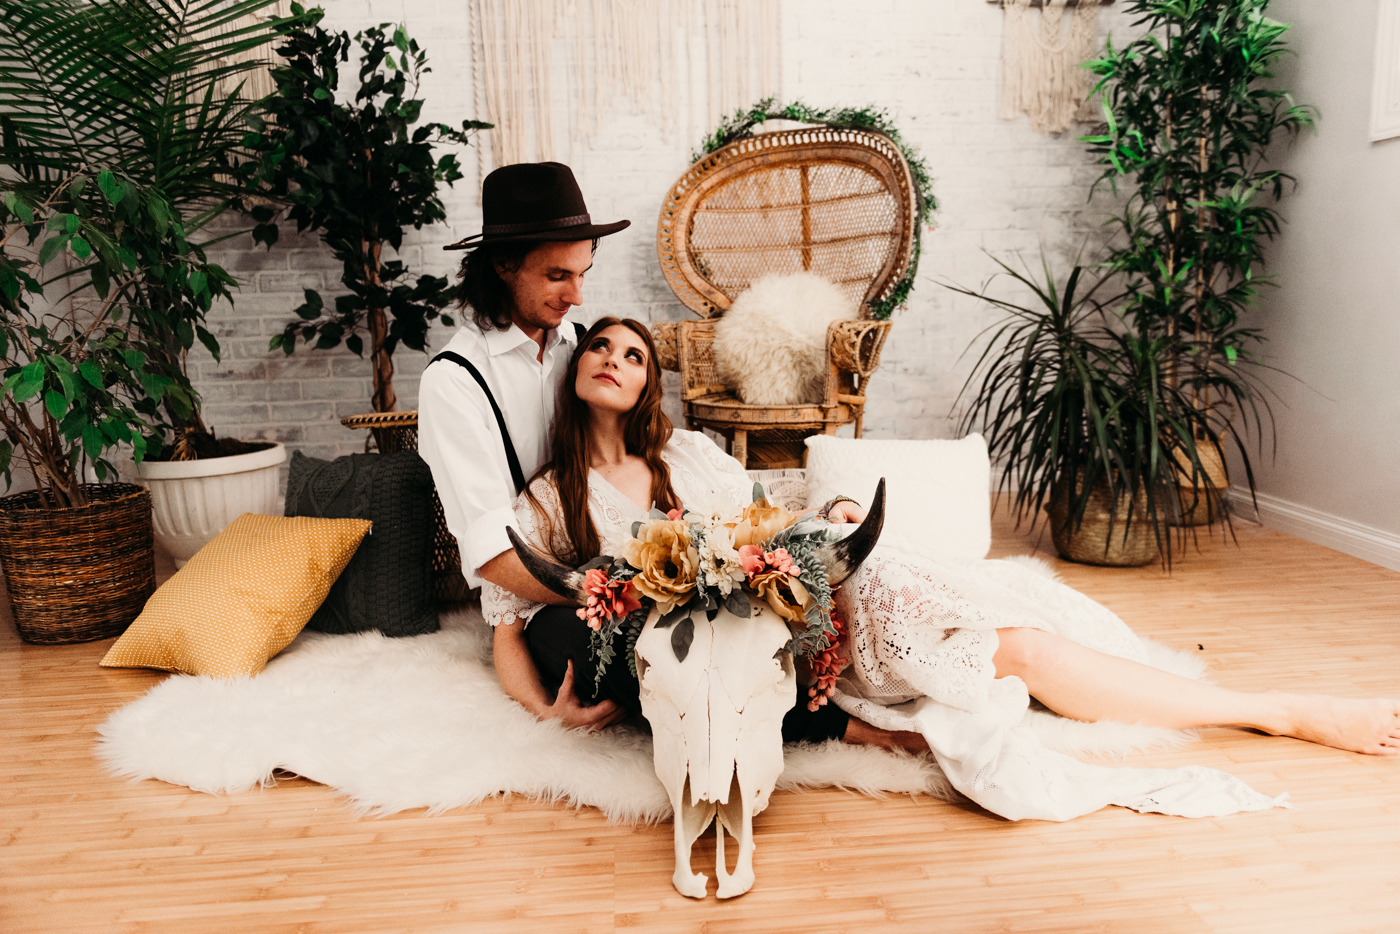 FortSt.John_photographer_TyraEPhotography_Wedding_Couple_Family_Photograhy_DawsonCreek_Elopement_Bride_Boduoir_Portraits-1-2.jpg